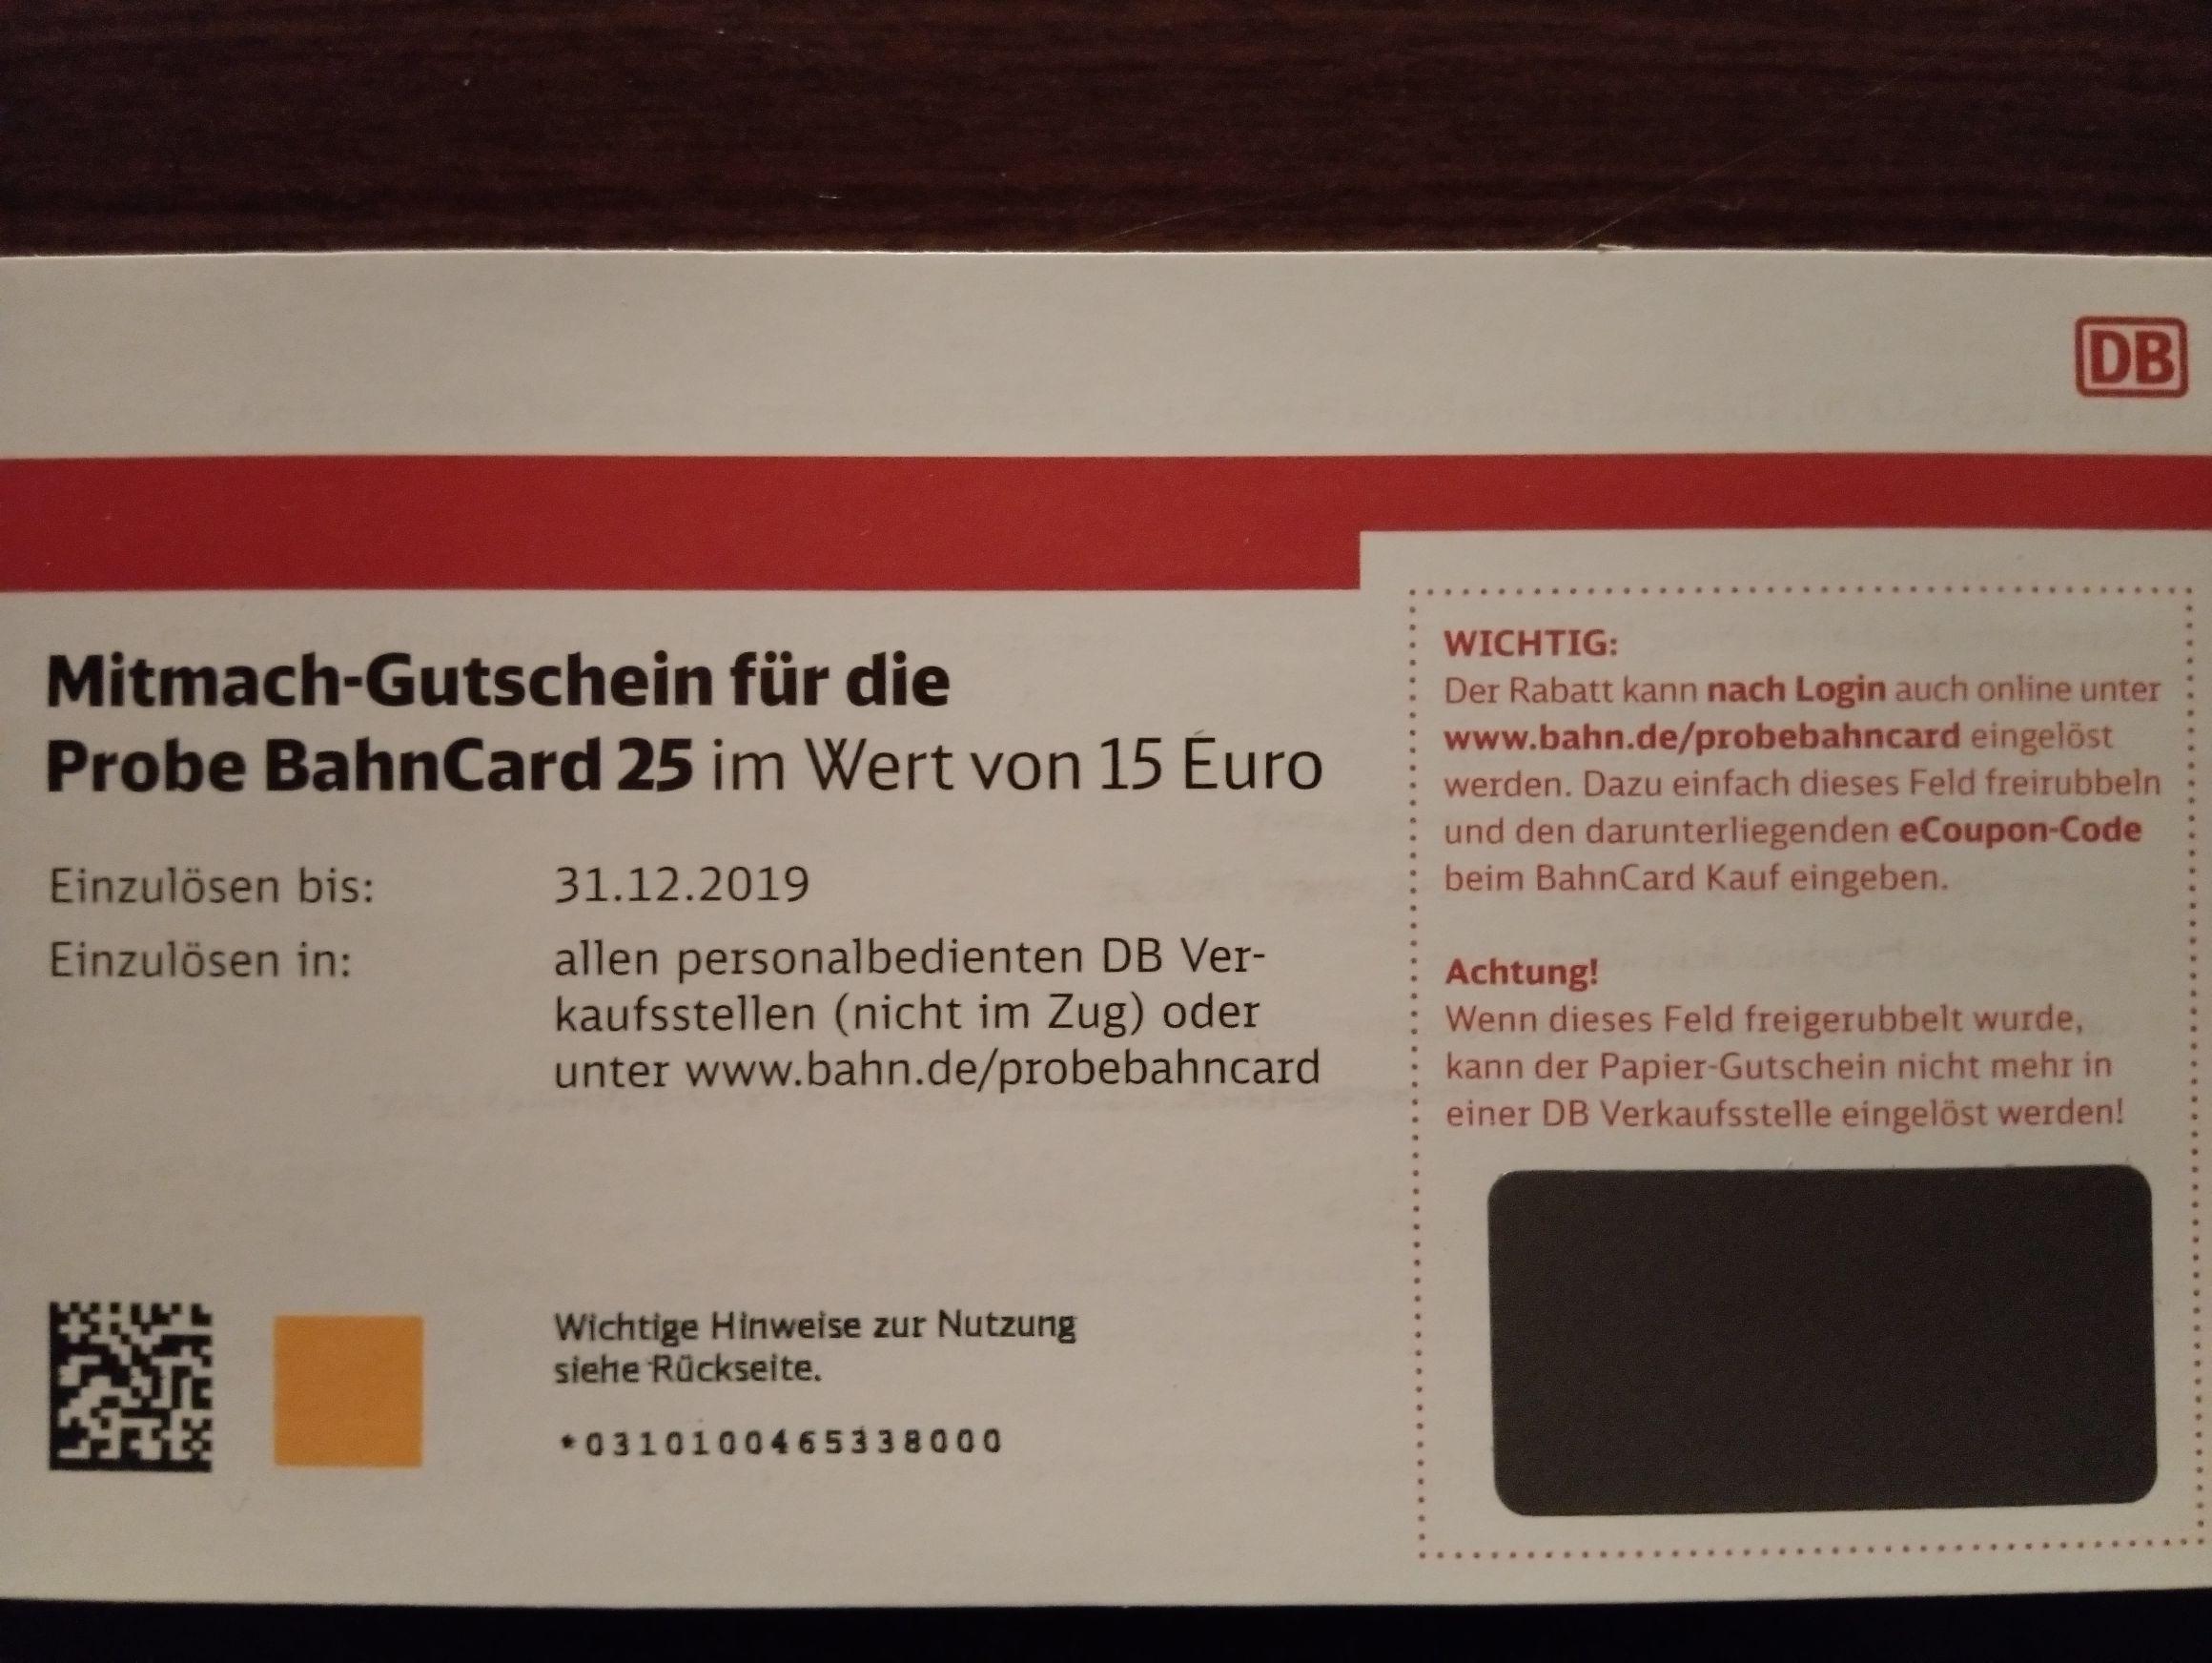 bahncard kreditkarte 2019